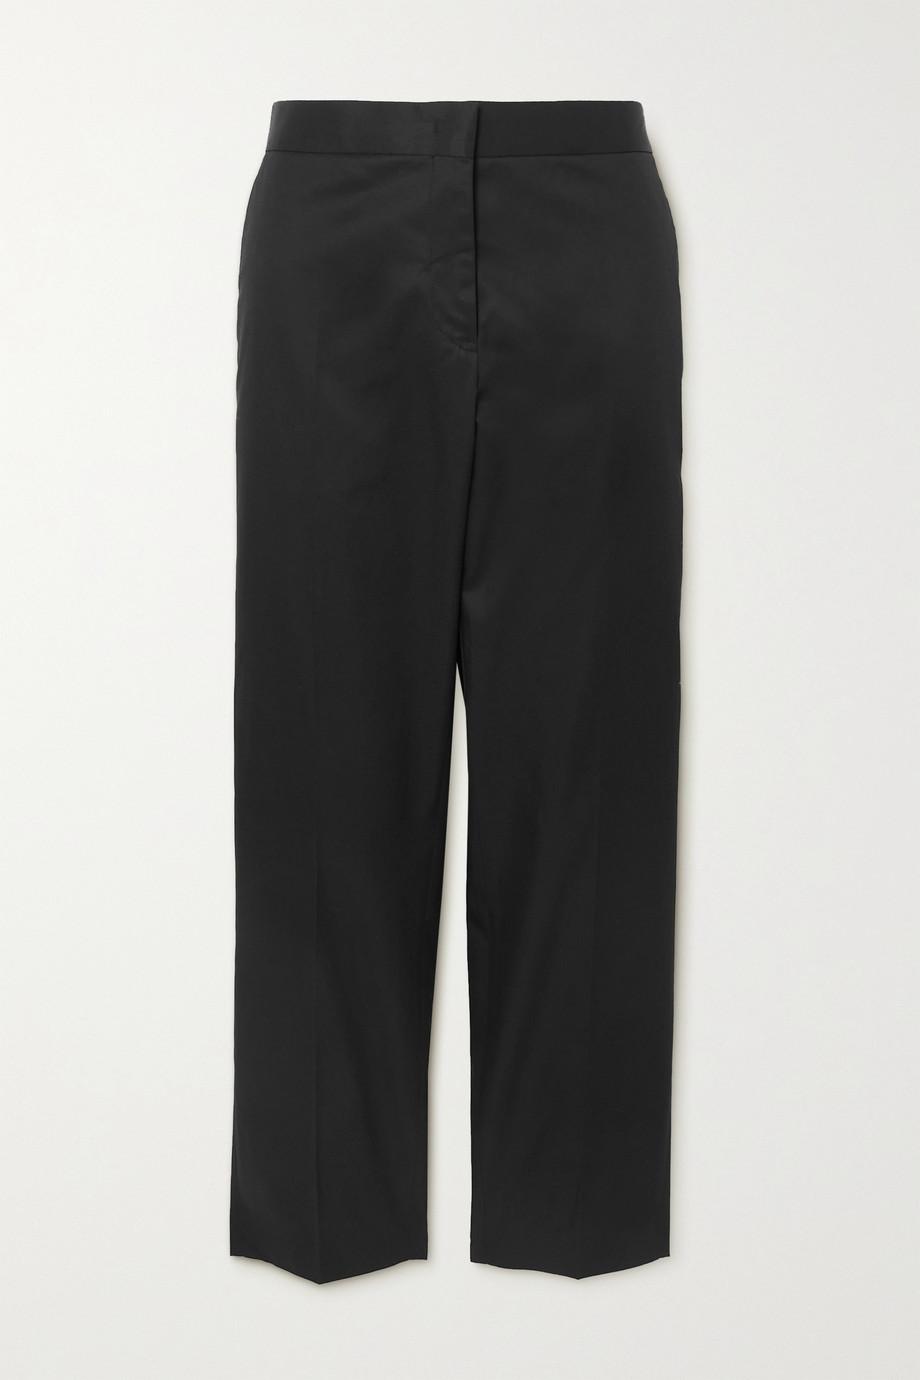 Jil Sander Cropped cotton-gabardine straight-leg pants